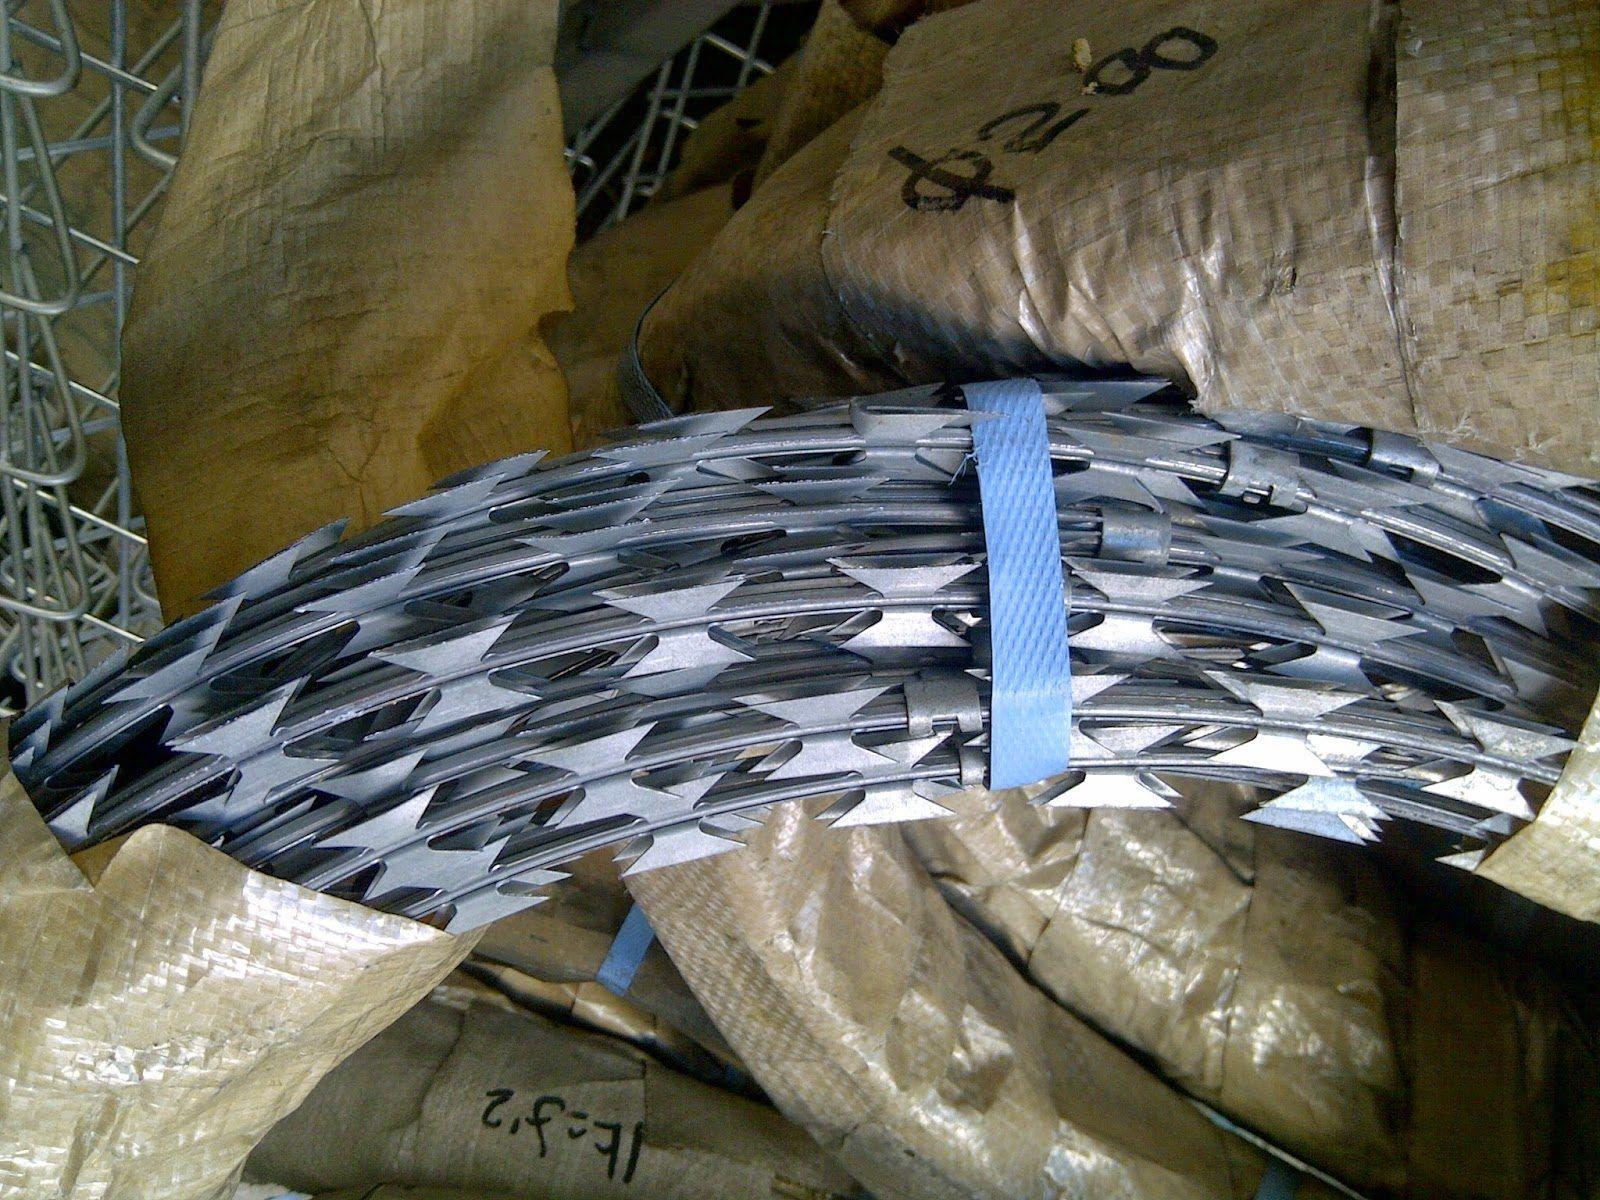 Jual Kawat Silet Murah Surabaya Athariz Steel Steel